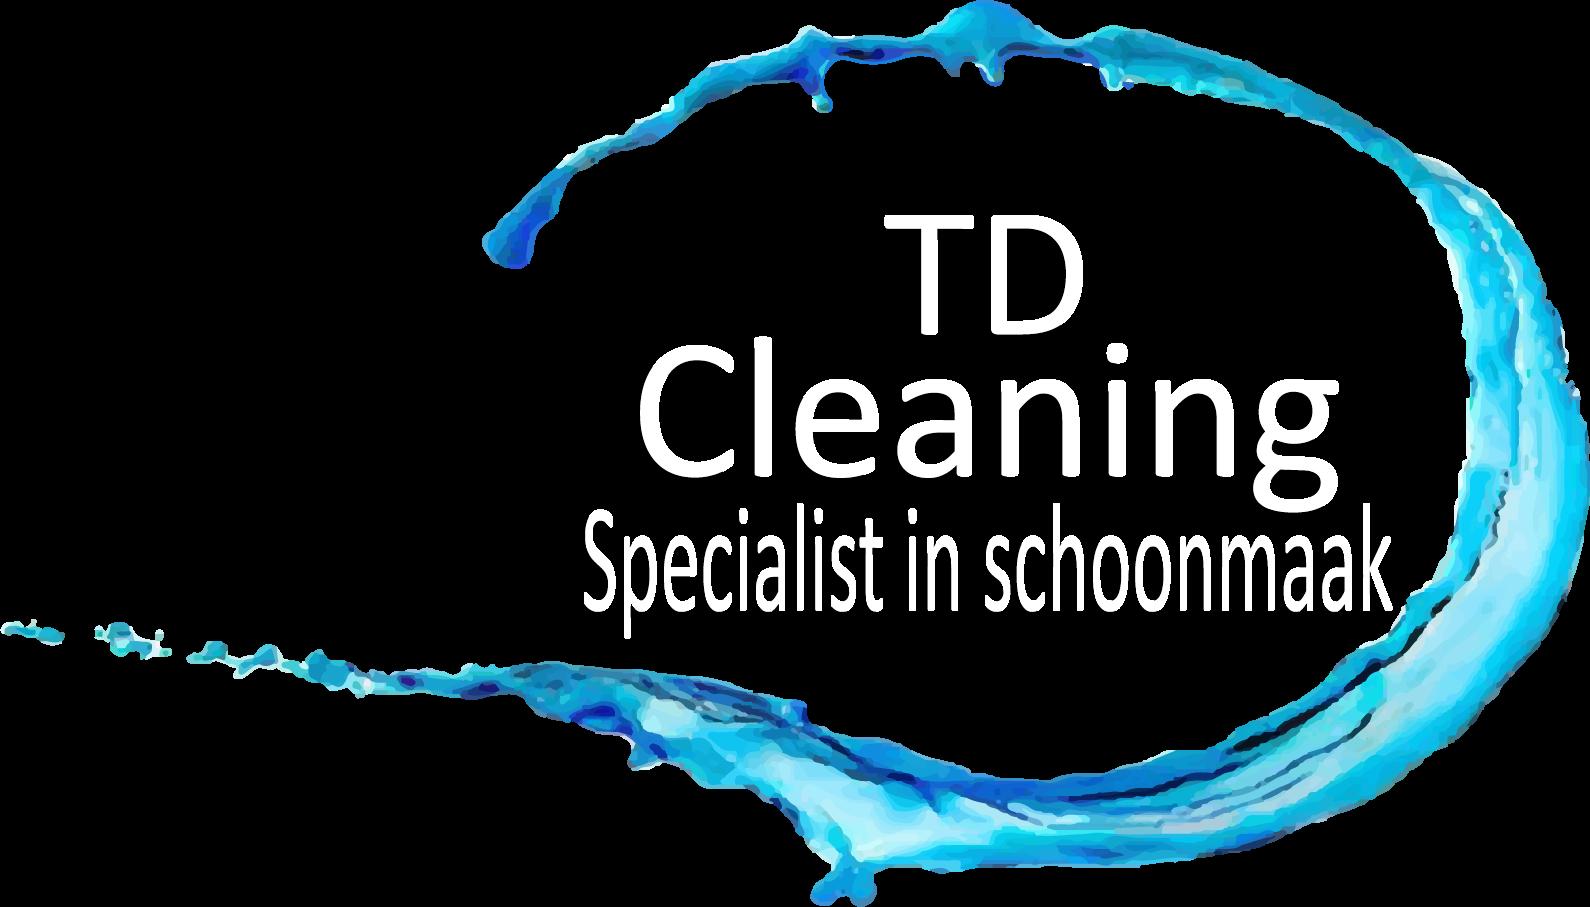 Schoonmaakbedrijf TD Cleaning